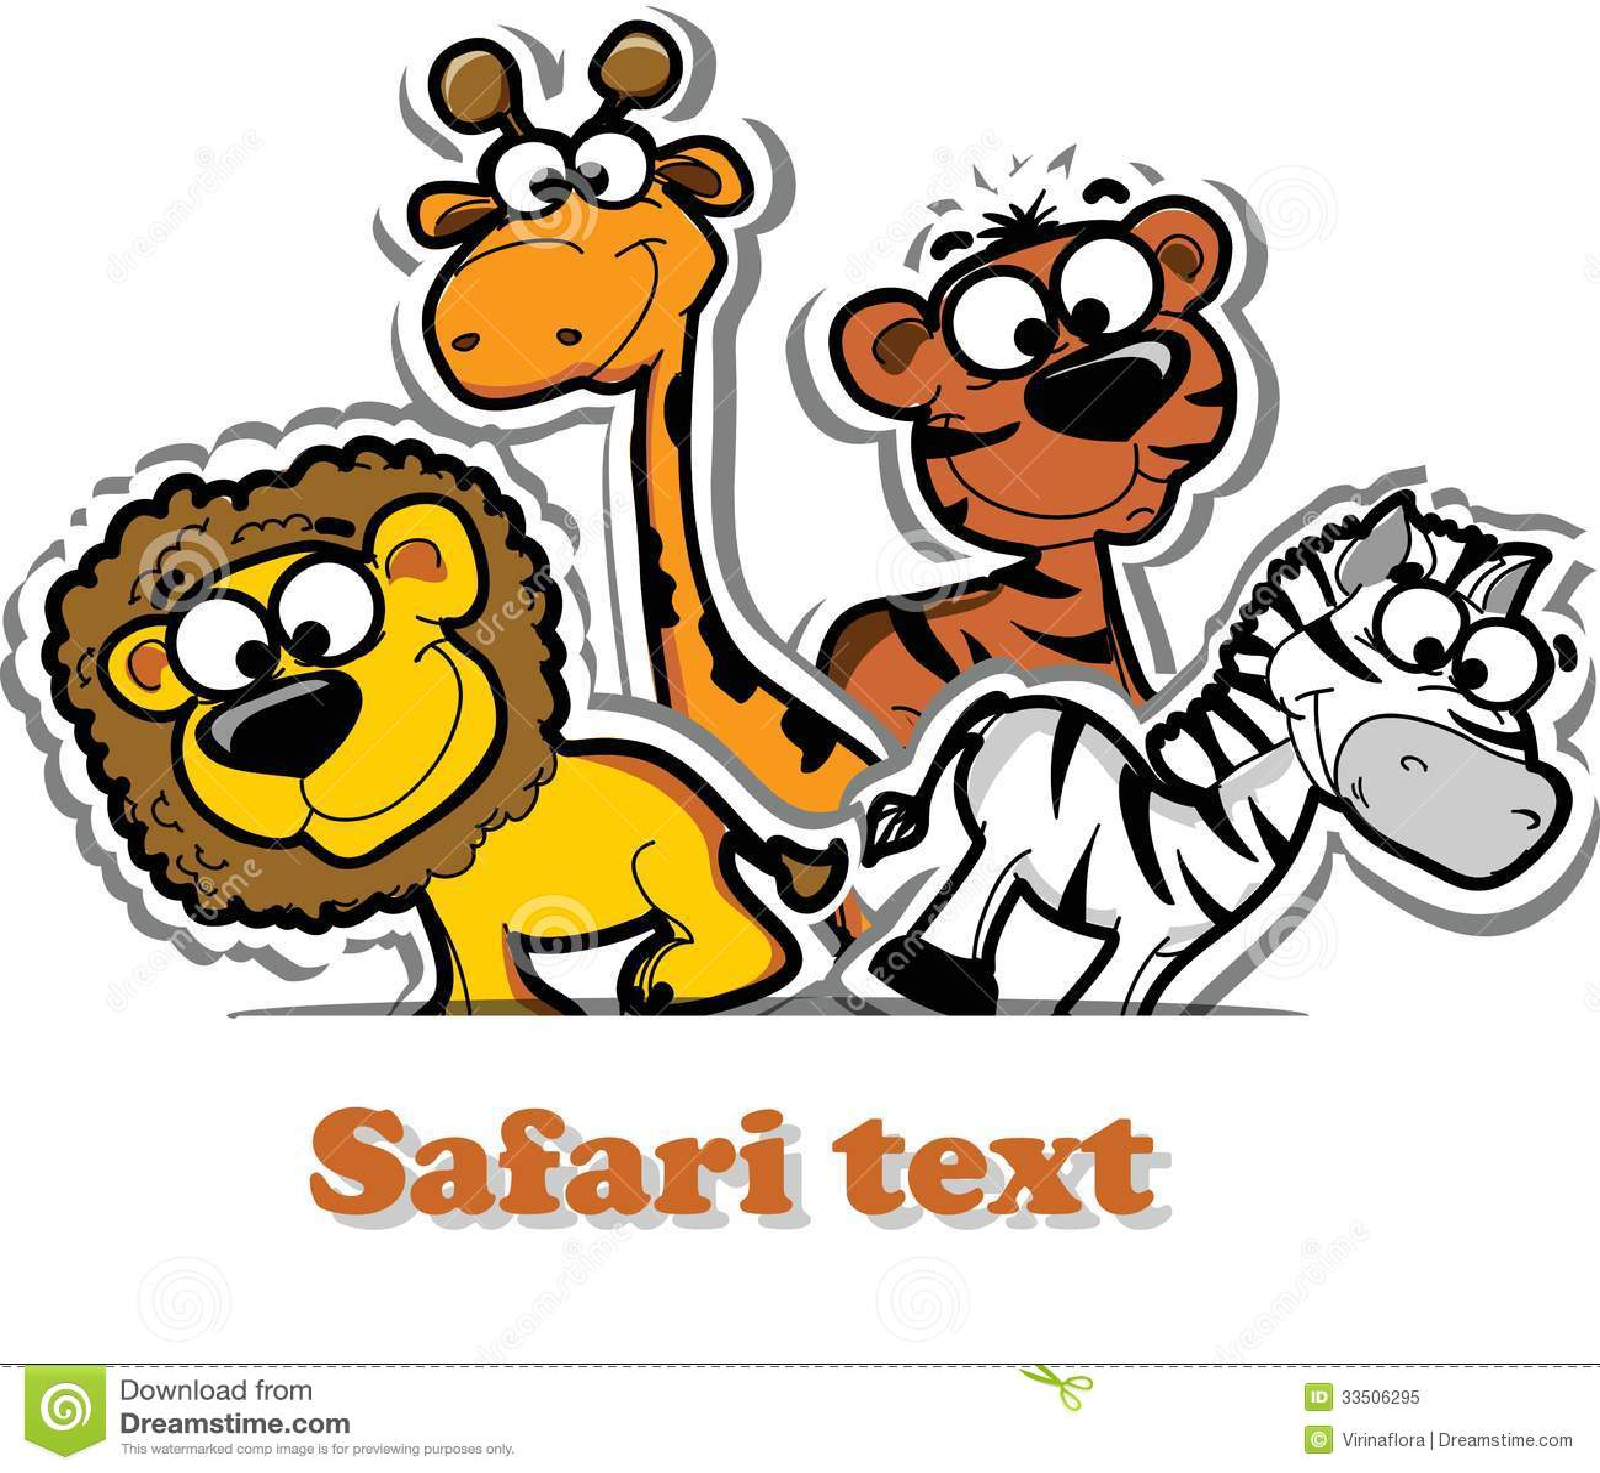 With Cute Safari Animal Vector Illustration Picture